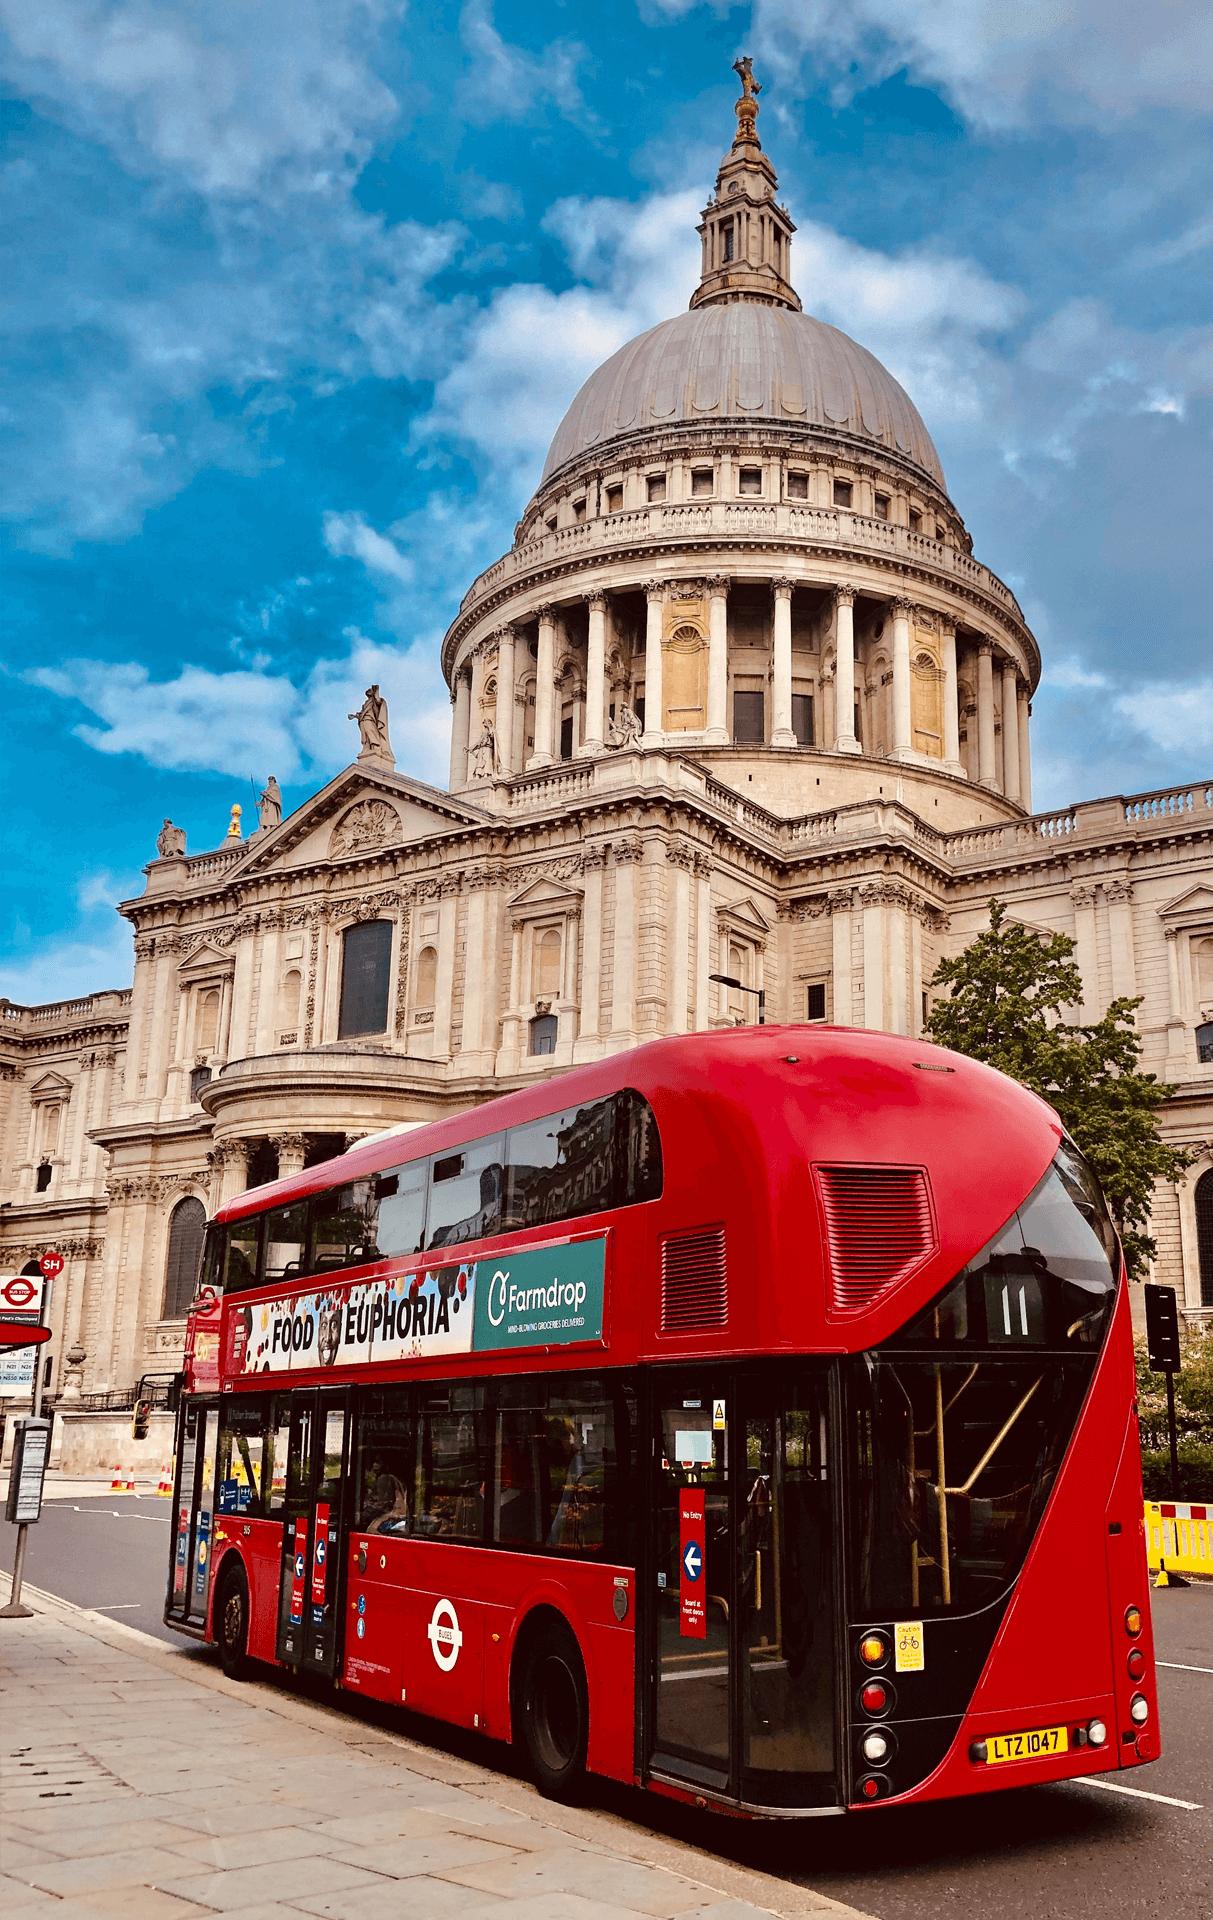 London St. Pauls